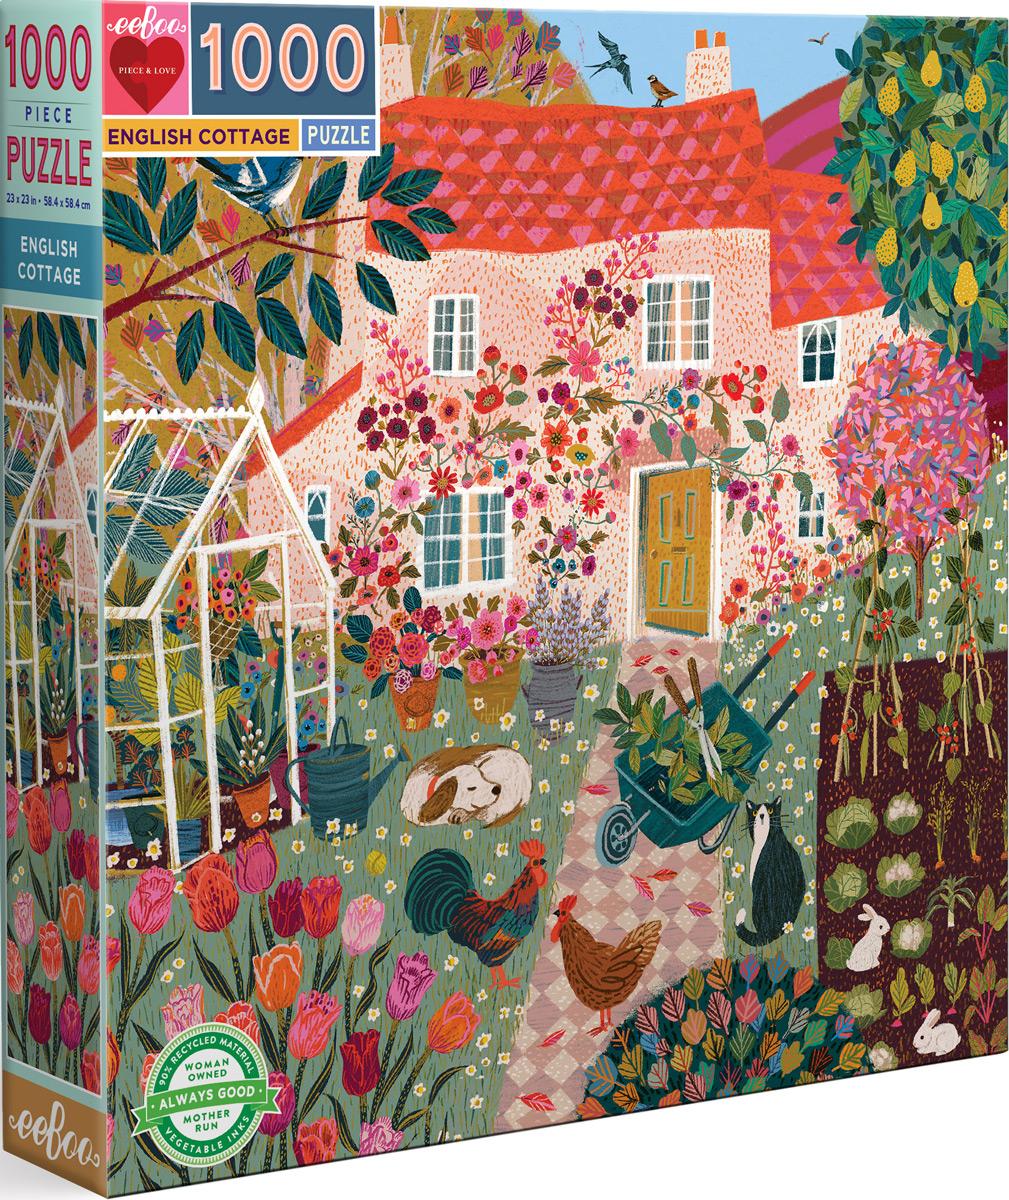 English Cottage Domestic Scene Jigsaw Puzzle